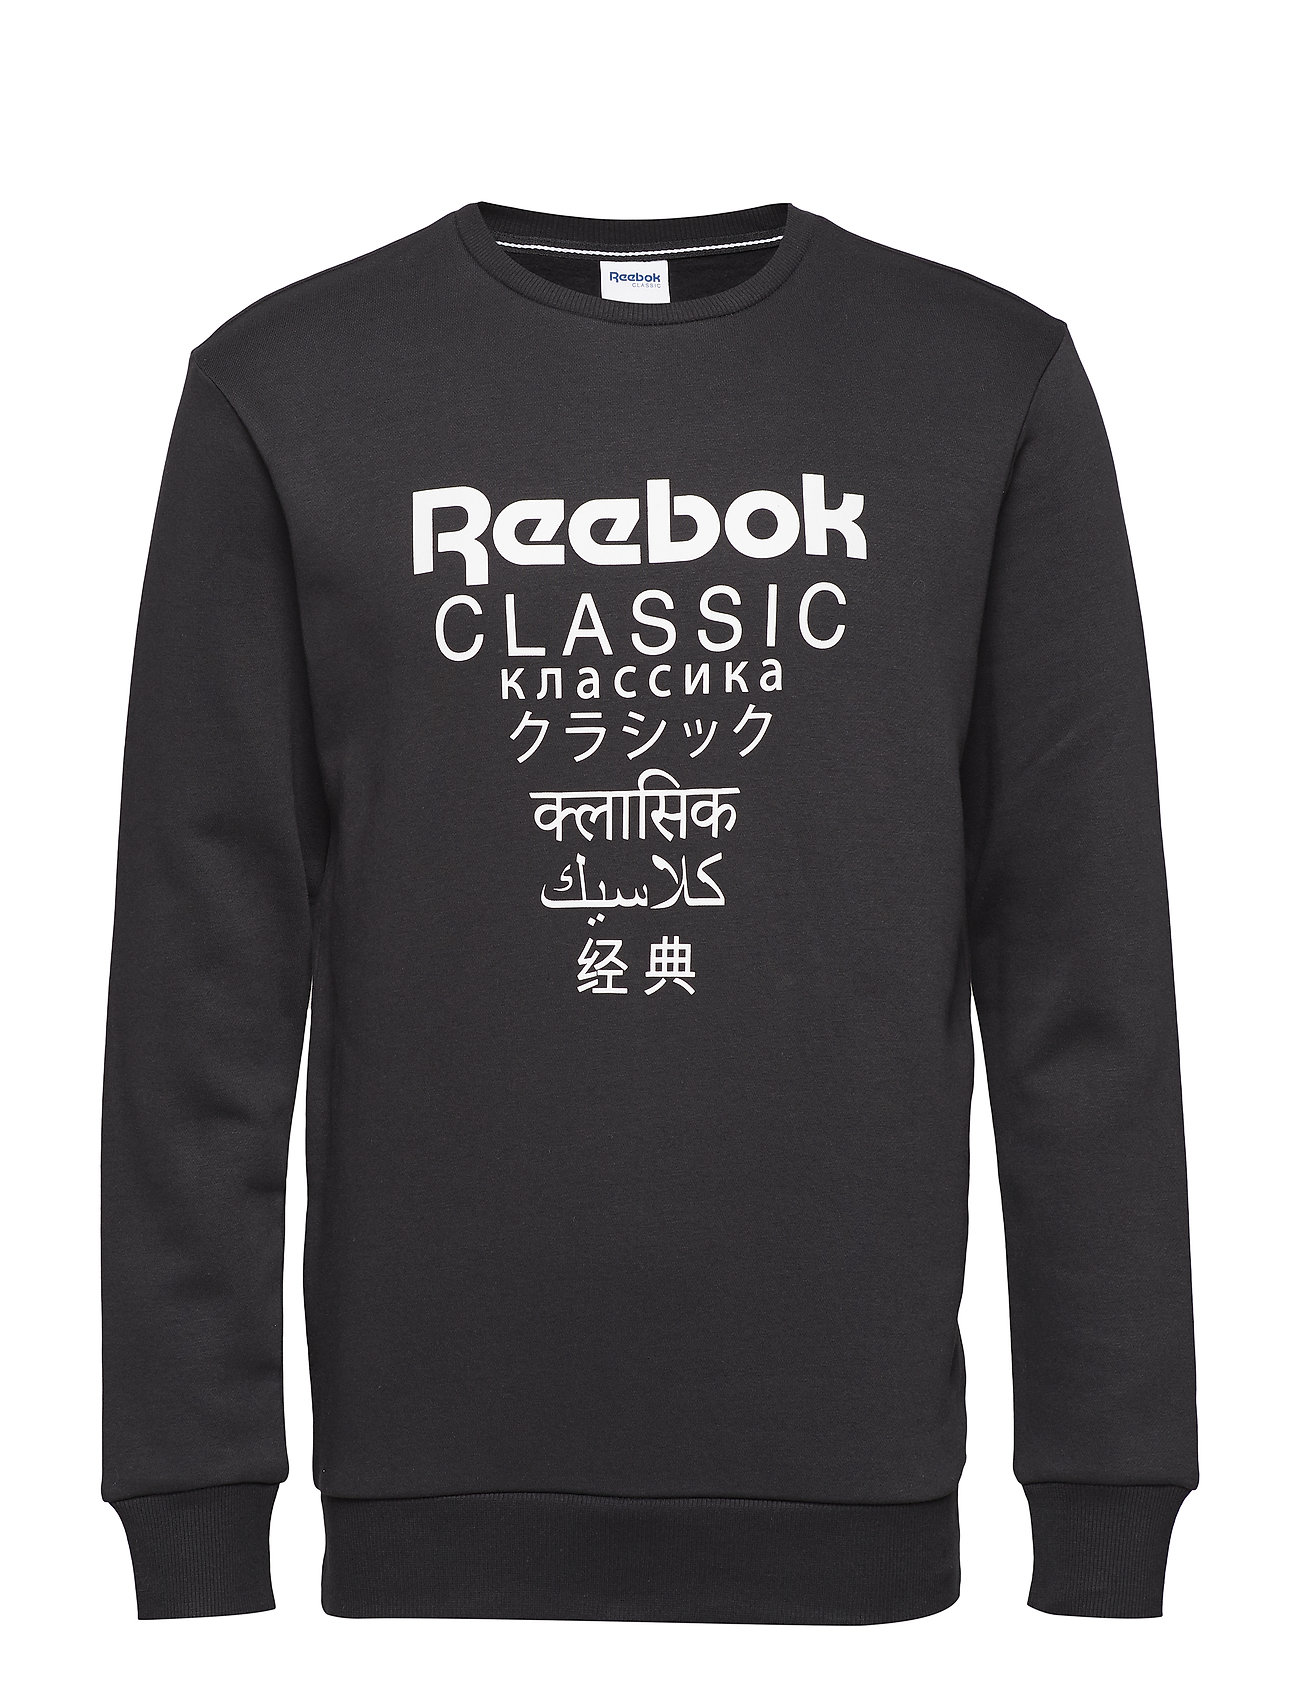 c2209bbf Gp Unisex Fleece Crew (Black) (35.97 €) - Reebok Classics -   Boozt.com